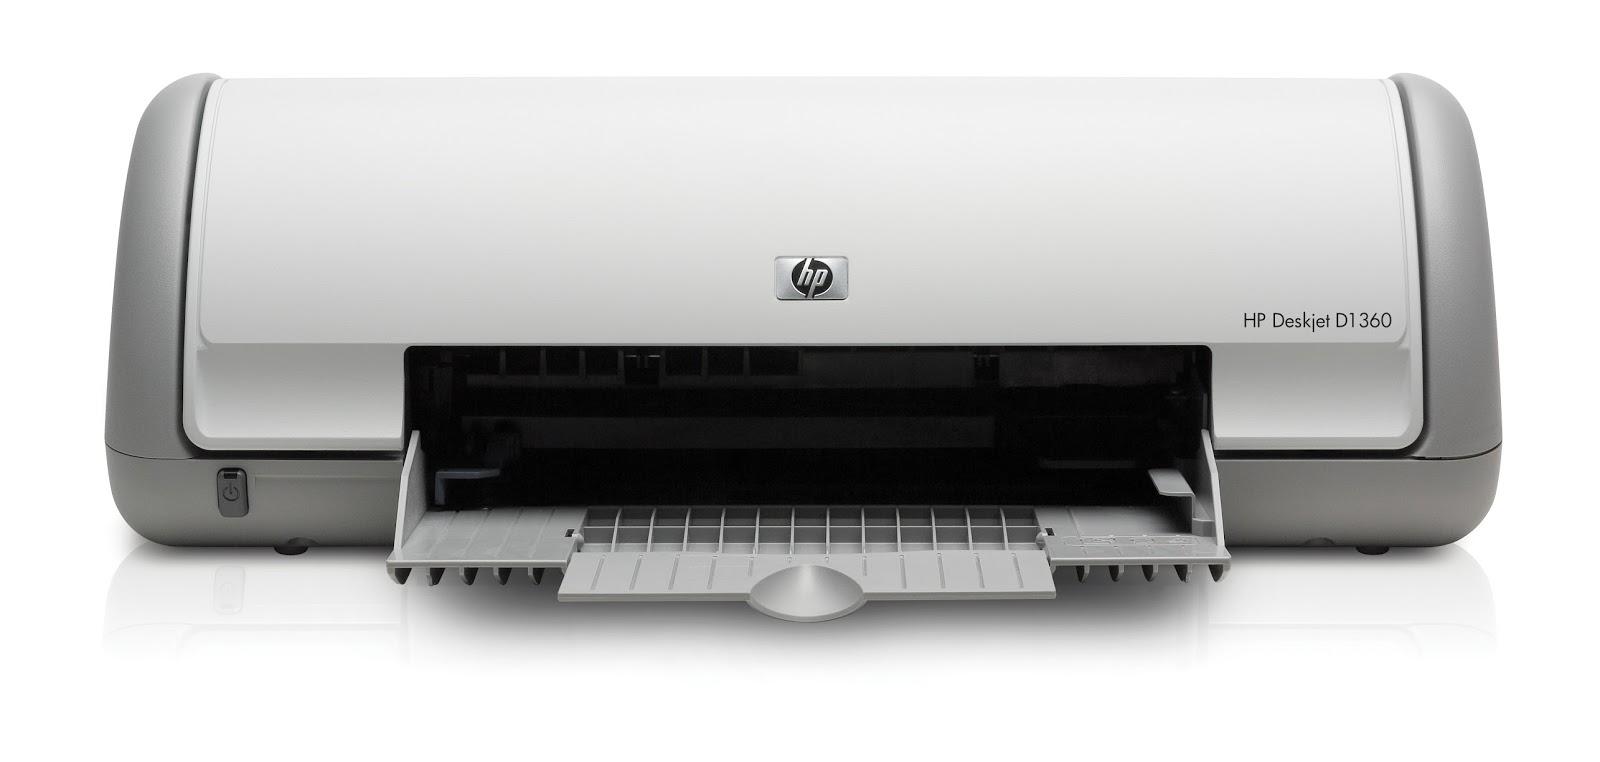 Hp deskjet d1360 printer drivers for windows 10, 8, 7, vista and xp.